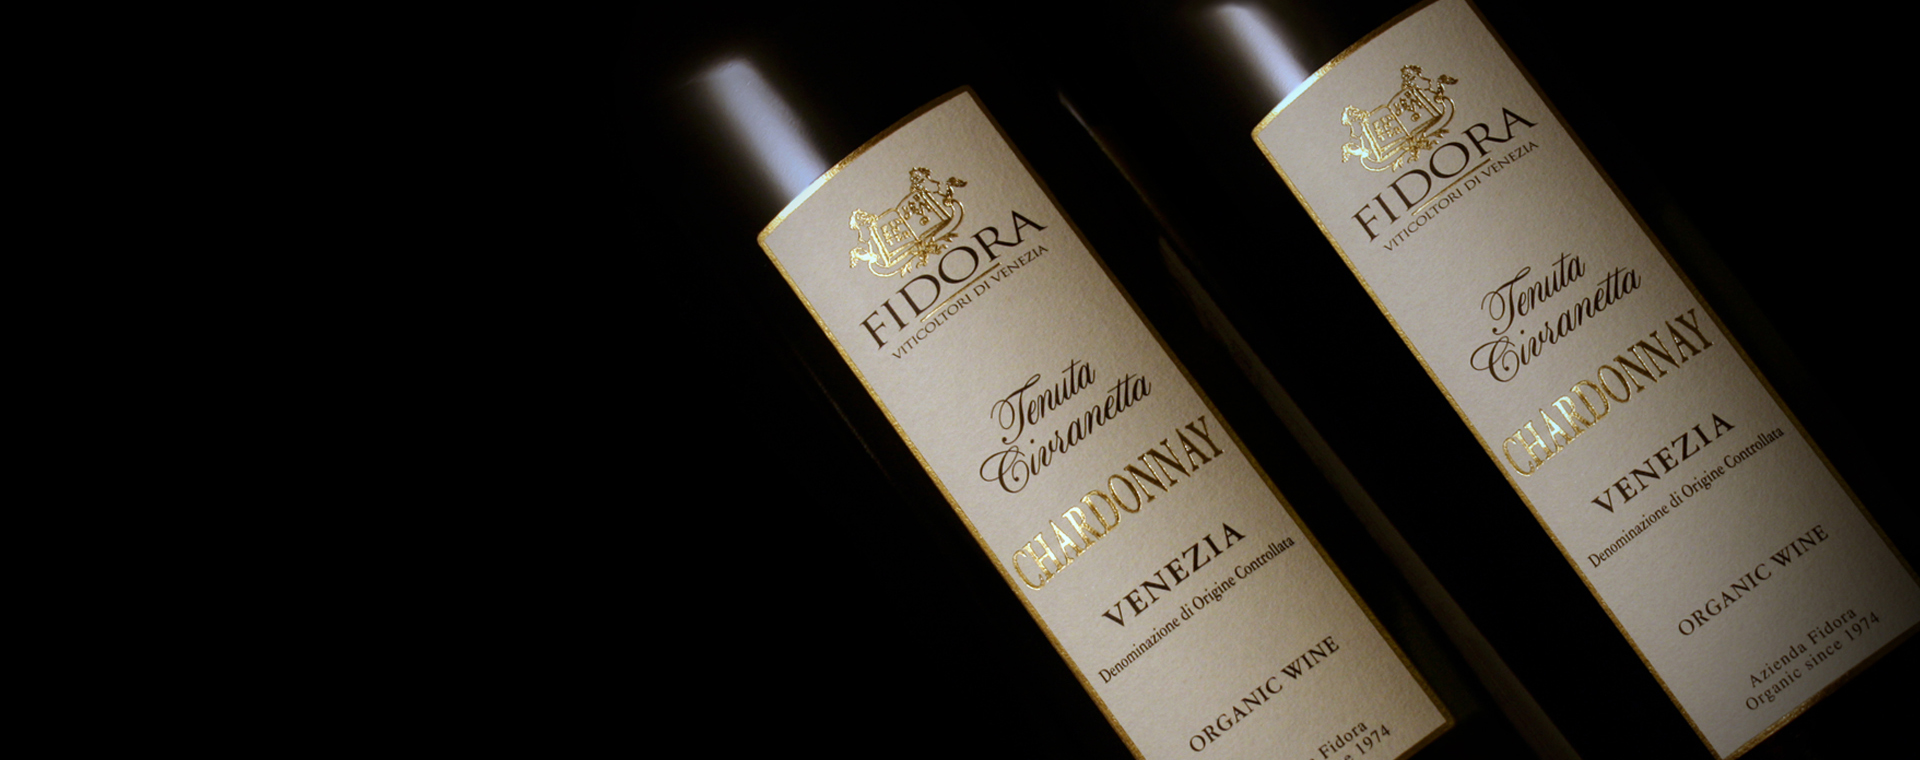 Chardonnay Prova EN